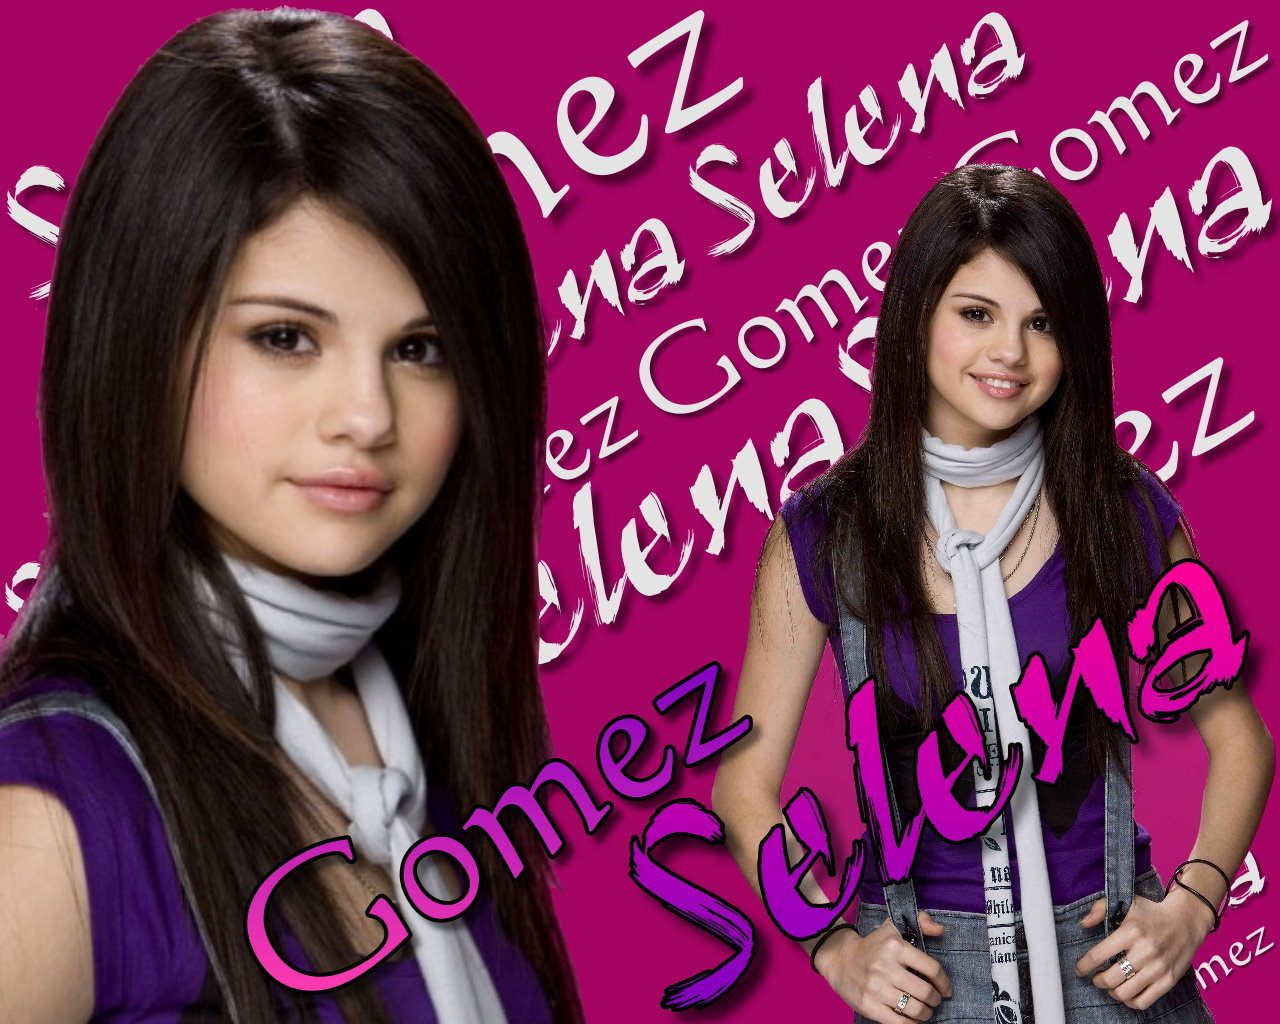 Selena Gomez Wallpaper   Selena Gomez Wallpaper 6897323 1280x1024